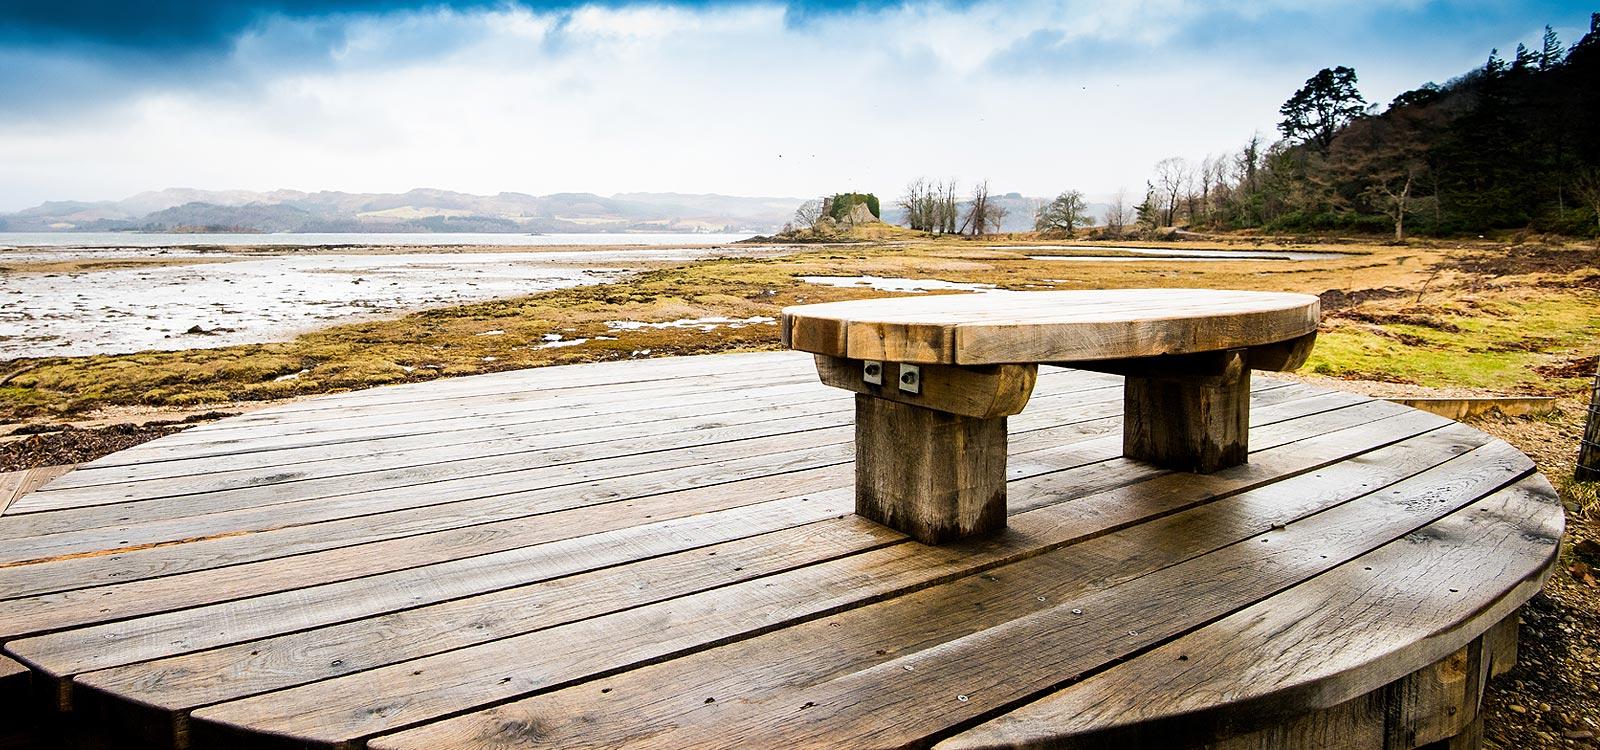 The Landscape's Story image